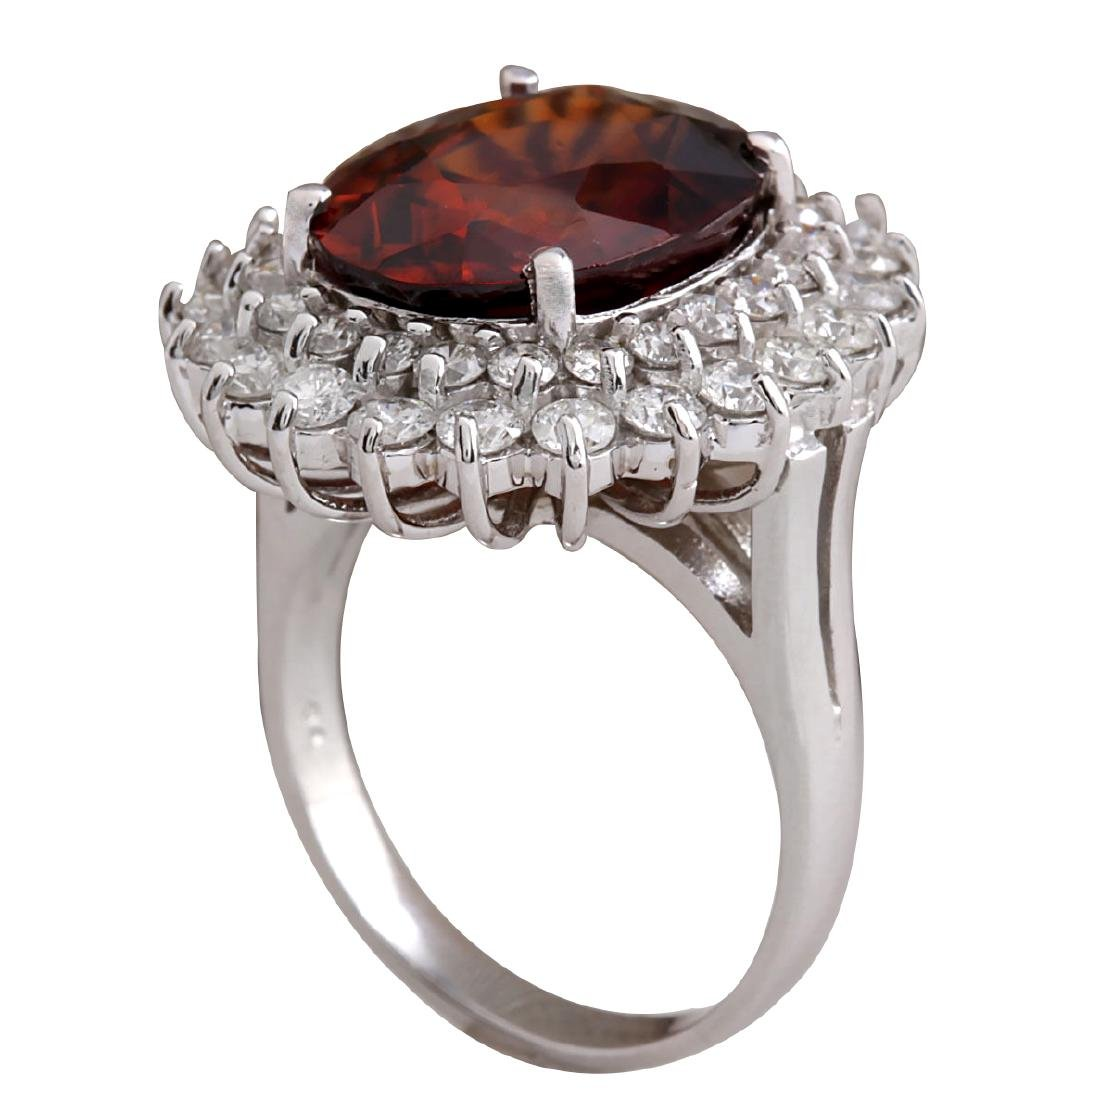 11.01CTW Natural Hessonite Garnet And Diamond Ring 18K - 3